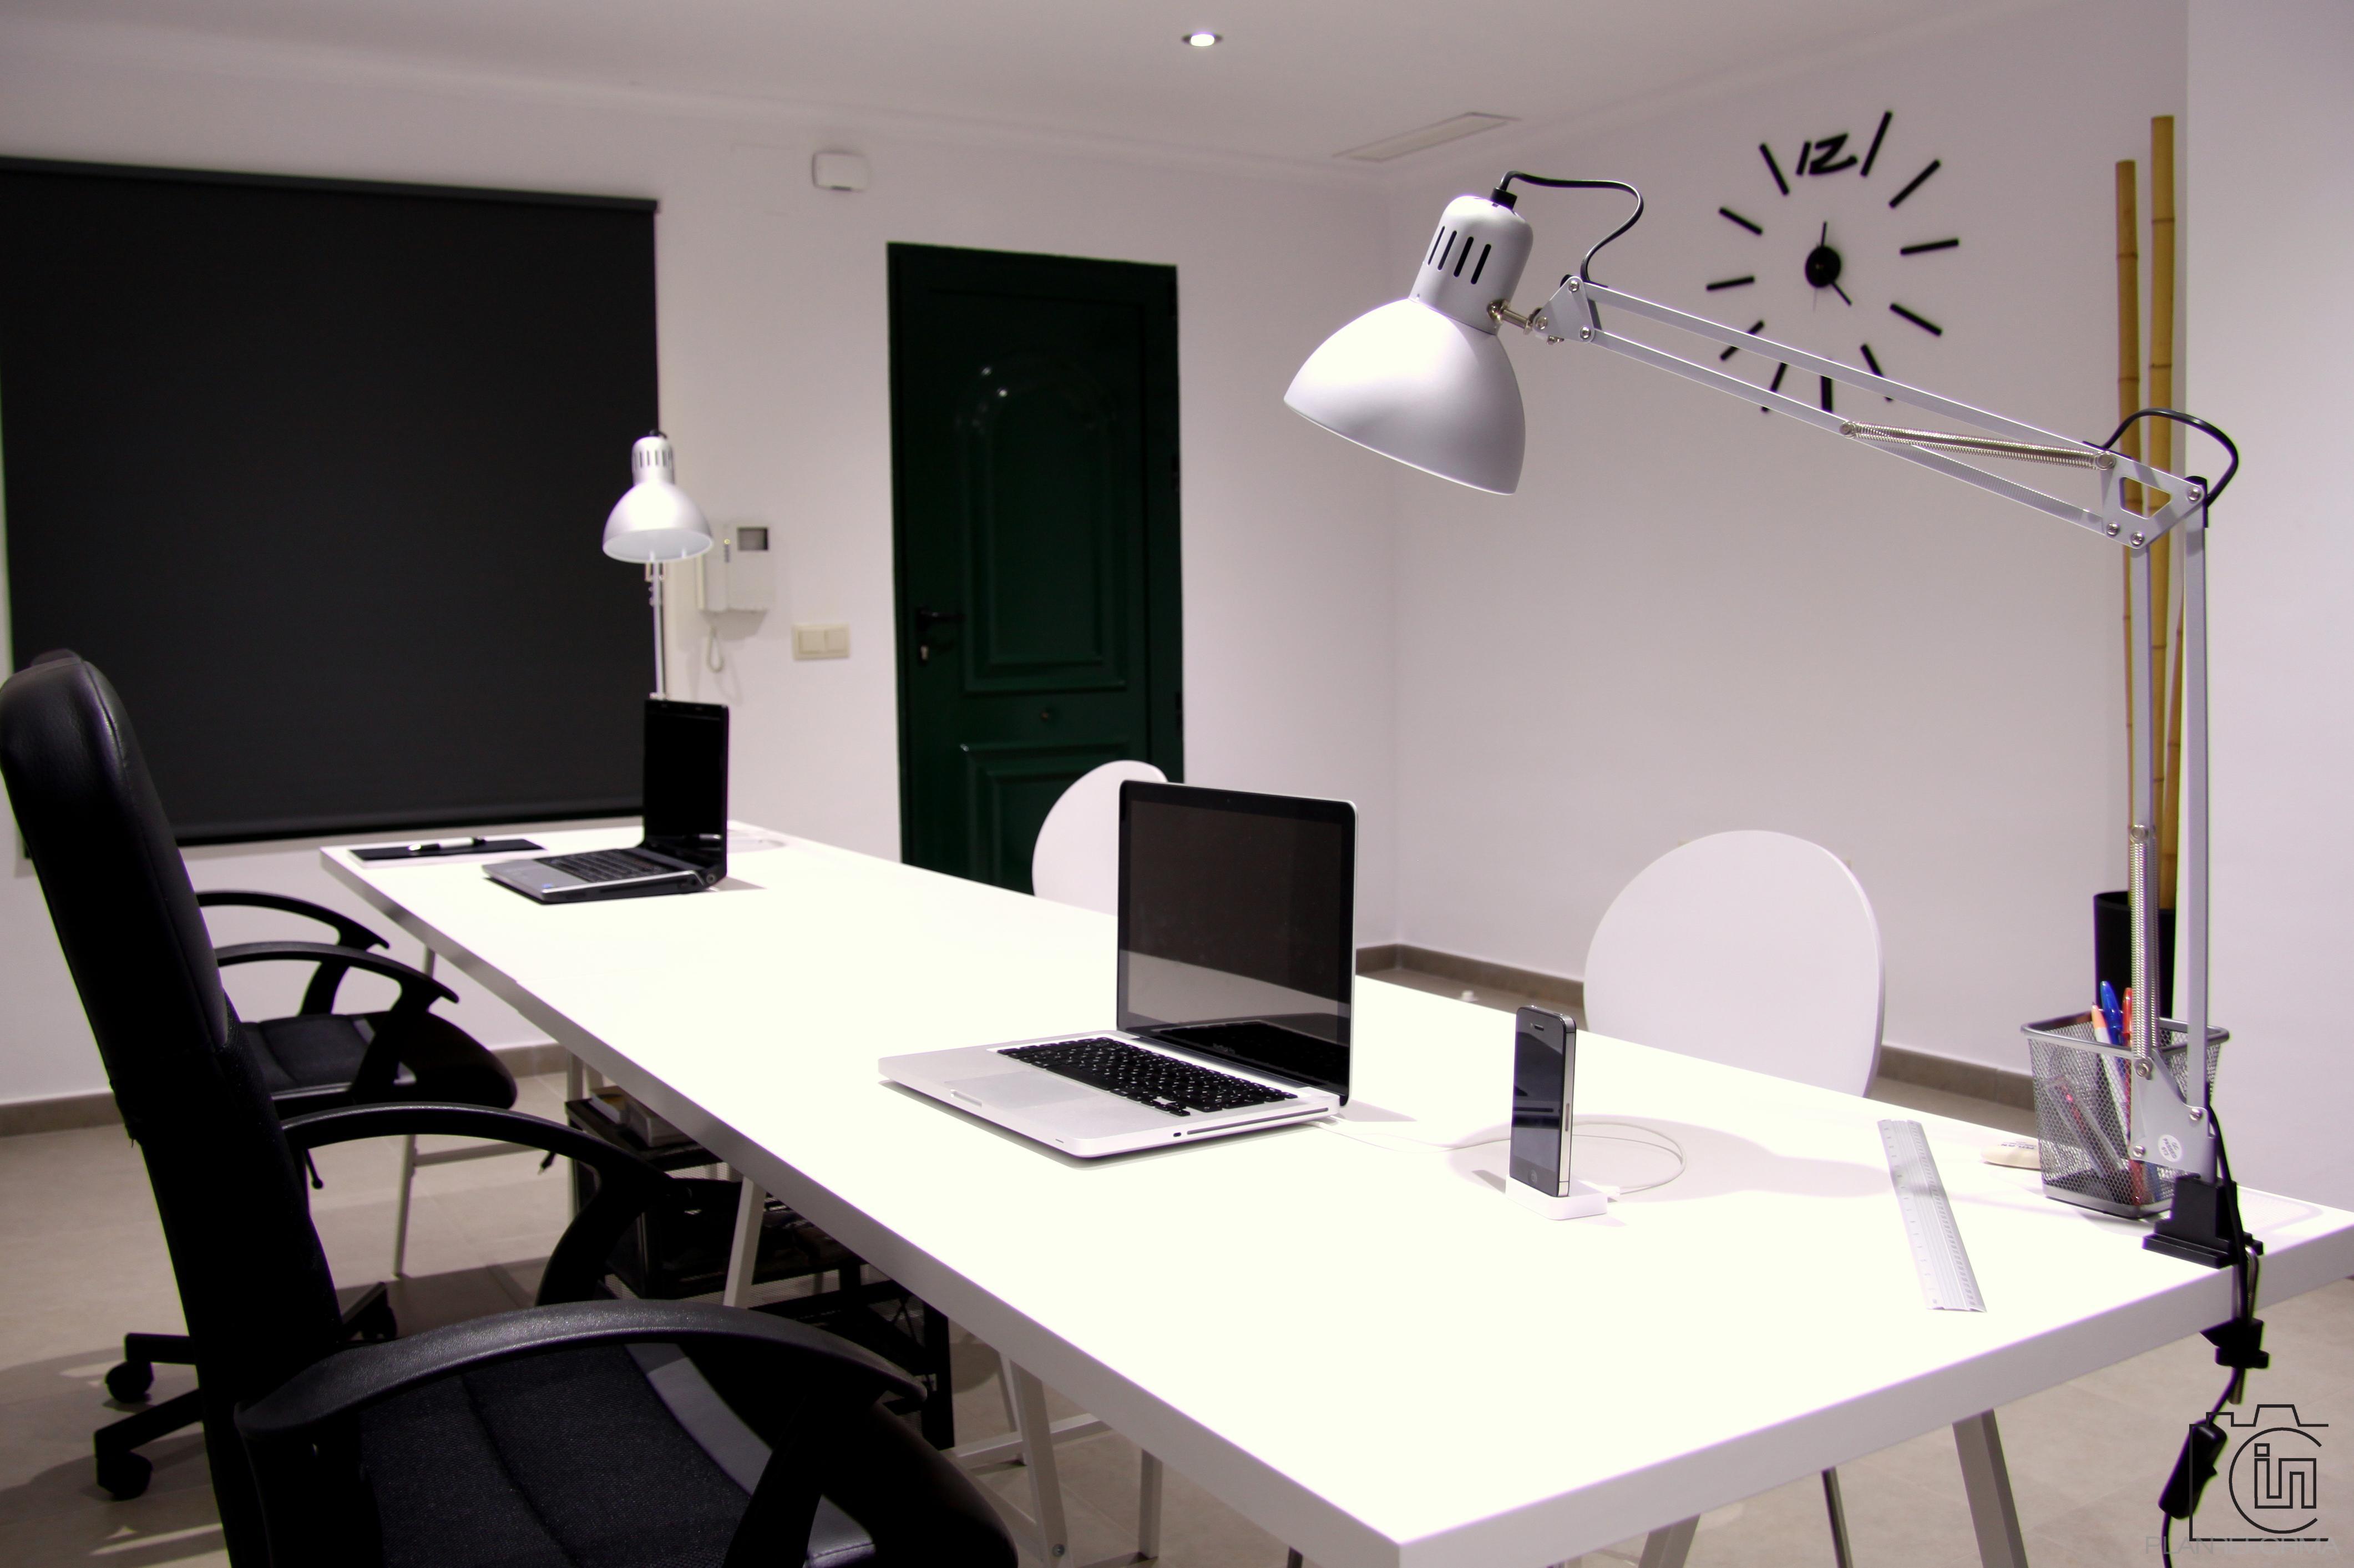 Estudio oficina style moderno color blanco gris negro for Arq estudio de arquitectura